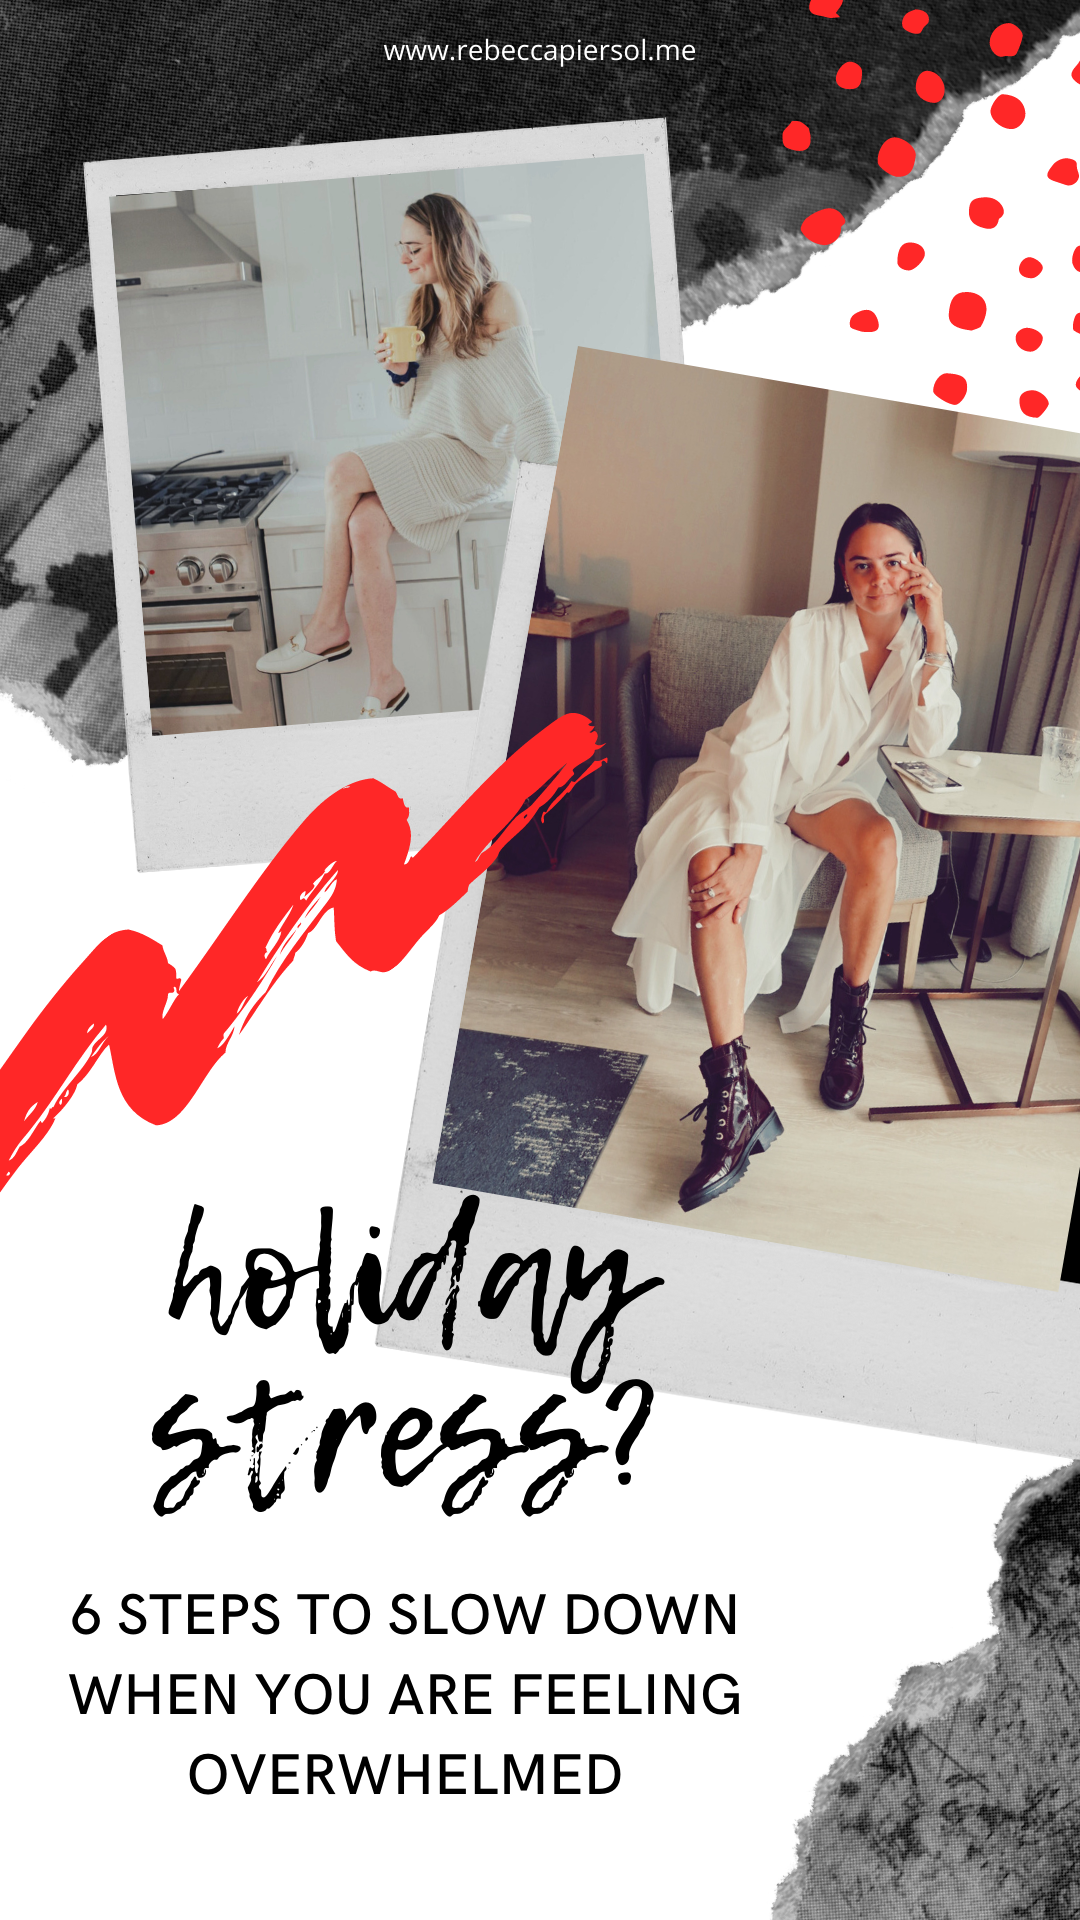 rebecca piersol holiday stress